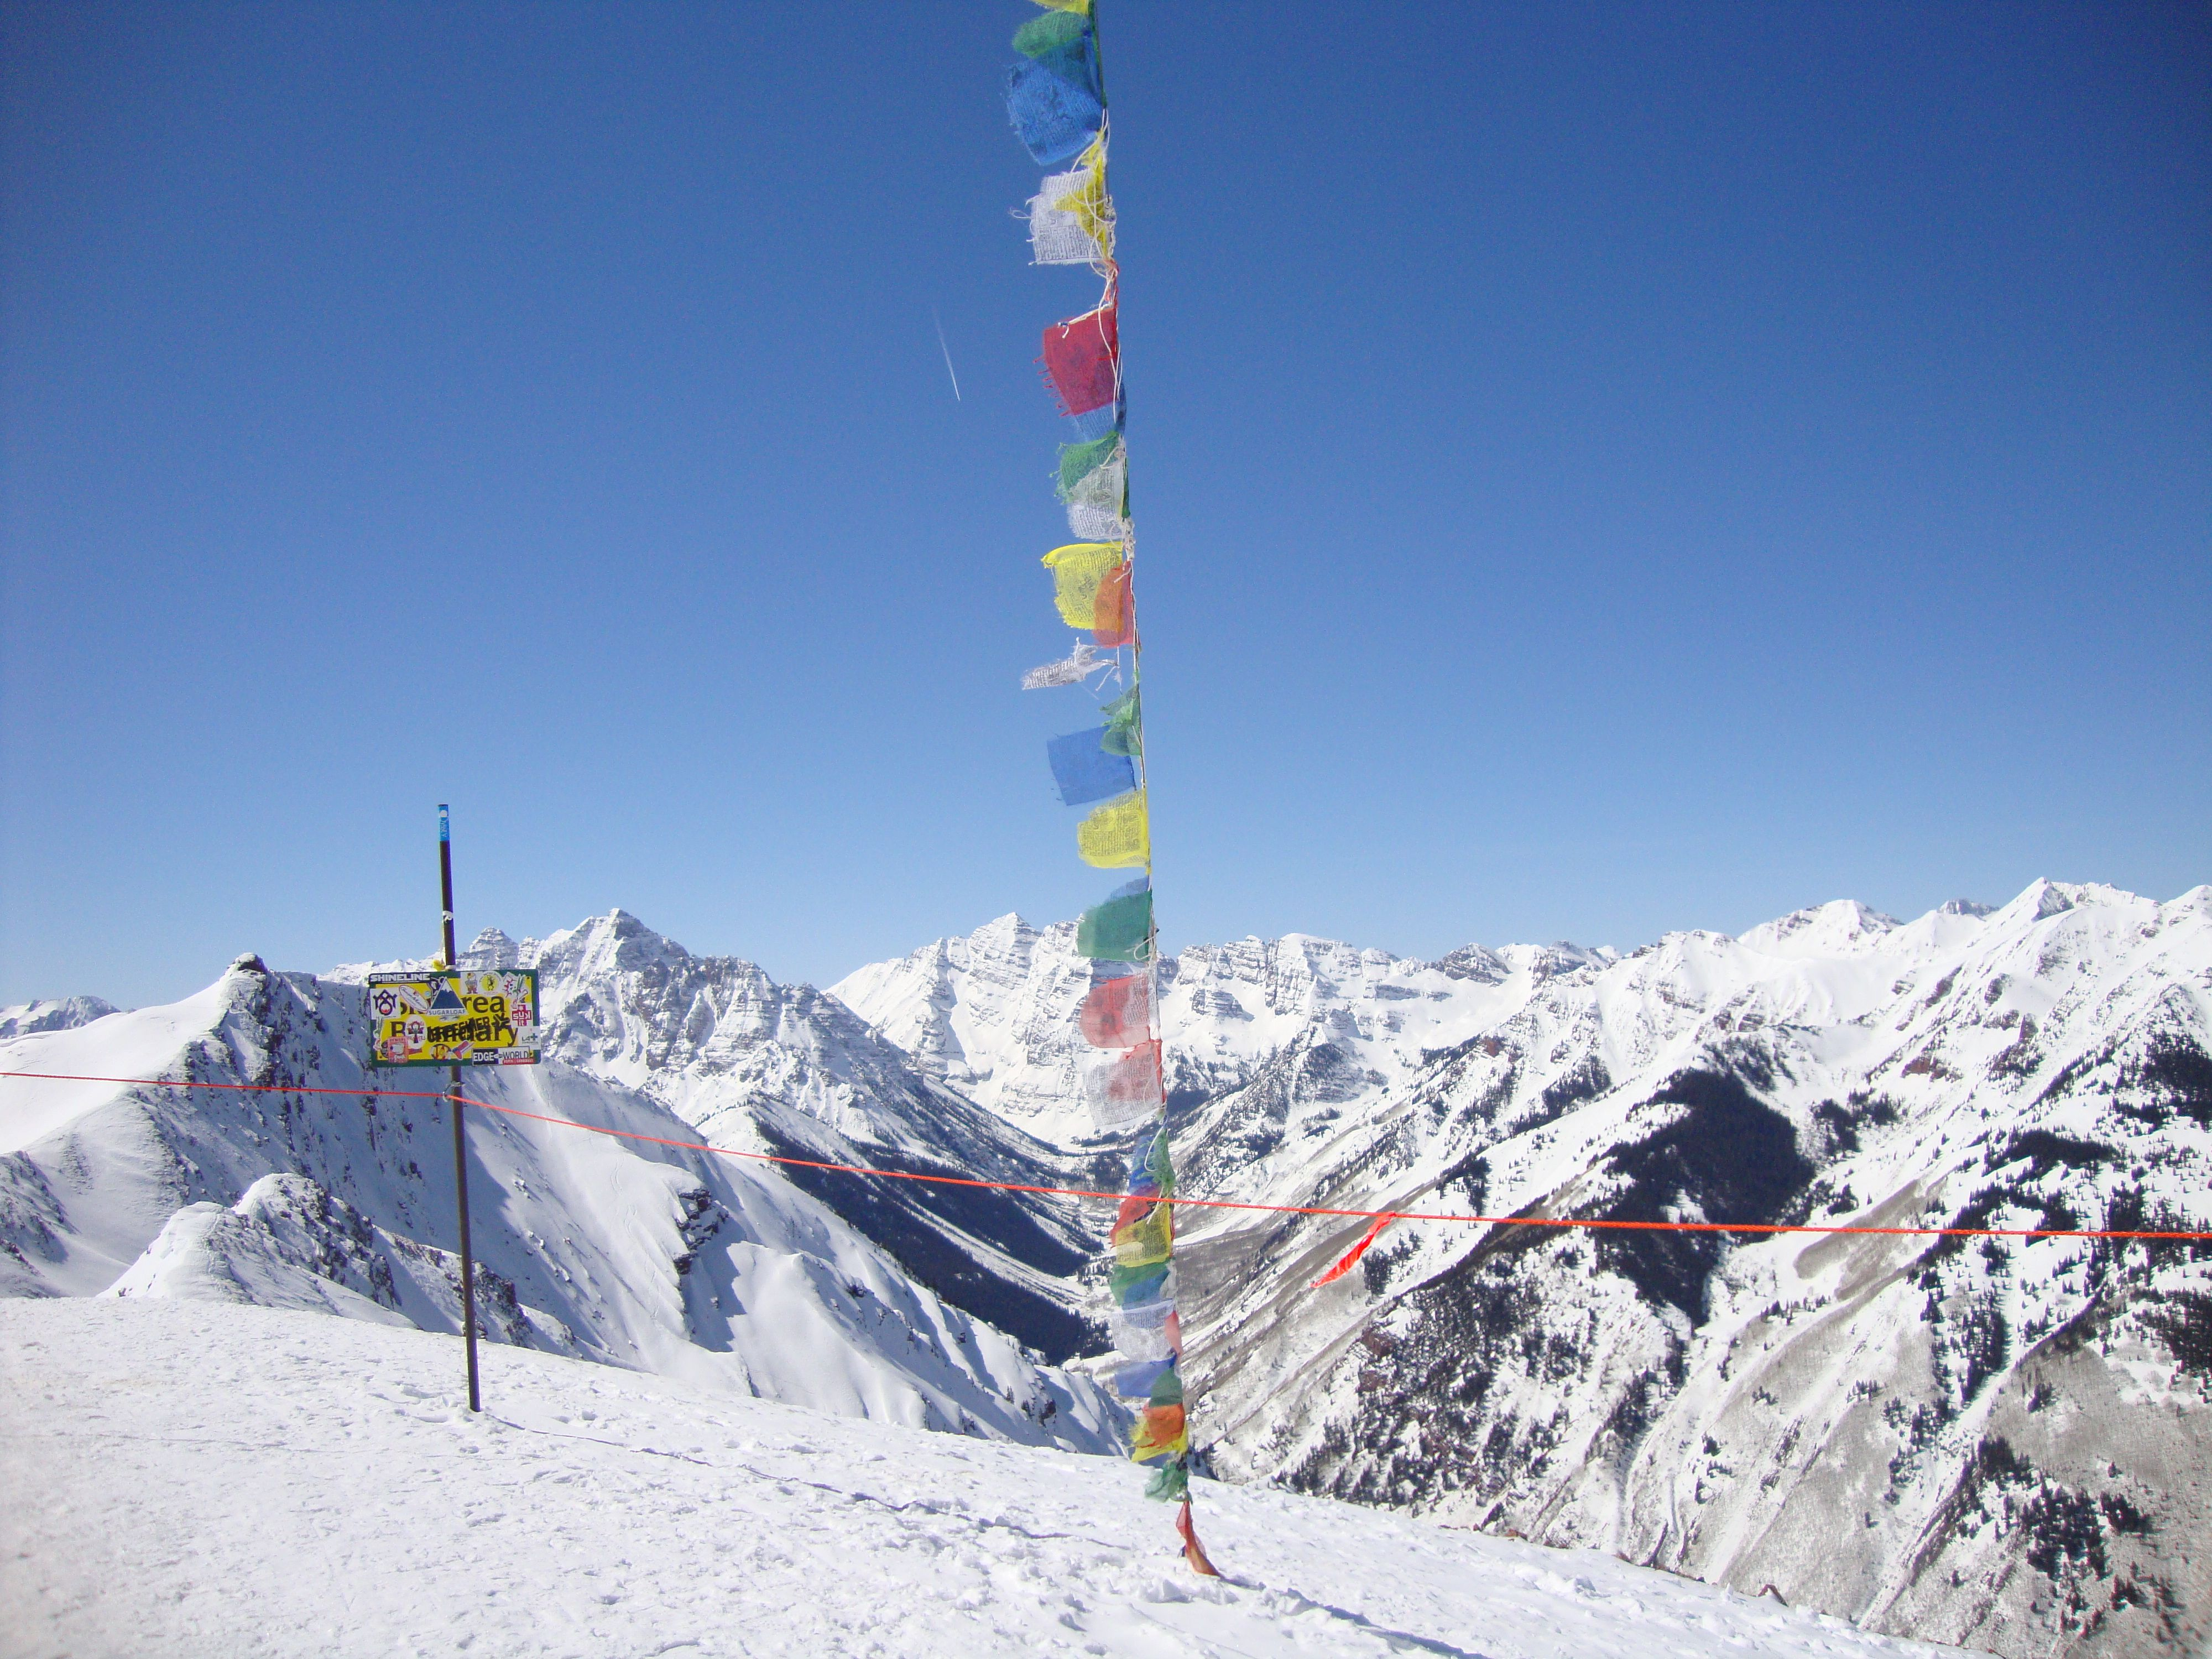 Prayer flags at summit of Aspen Highlands, Coloado